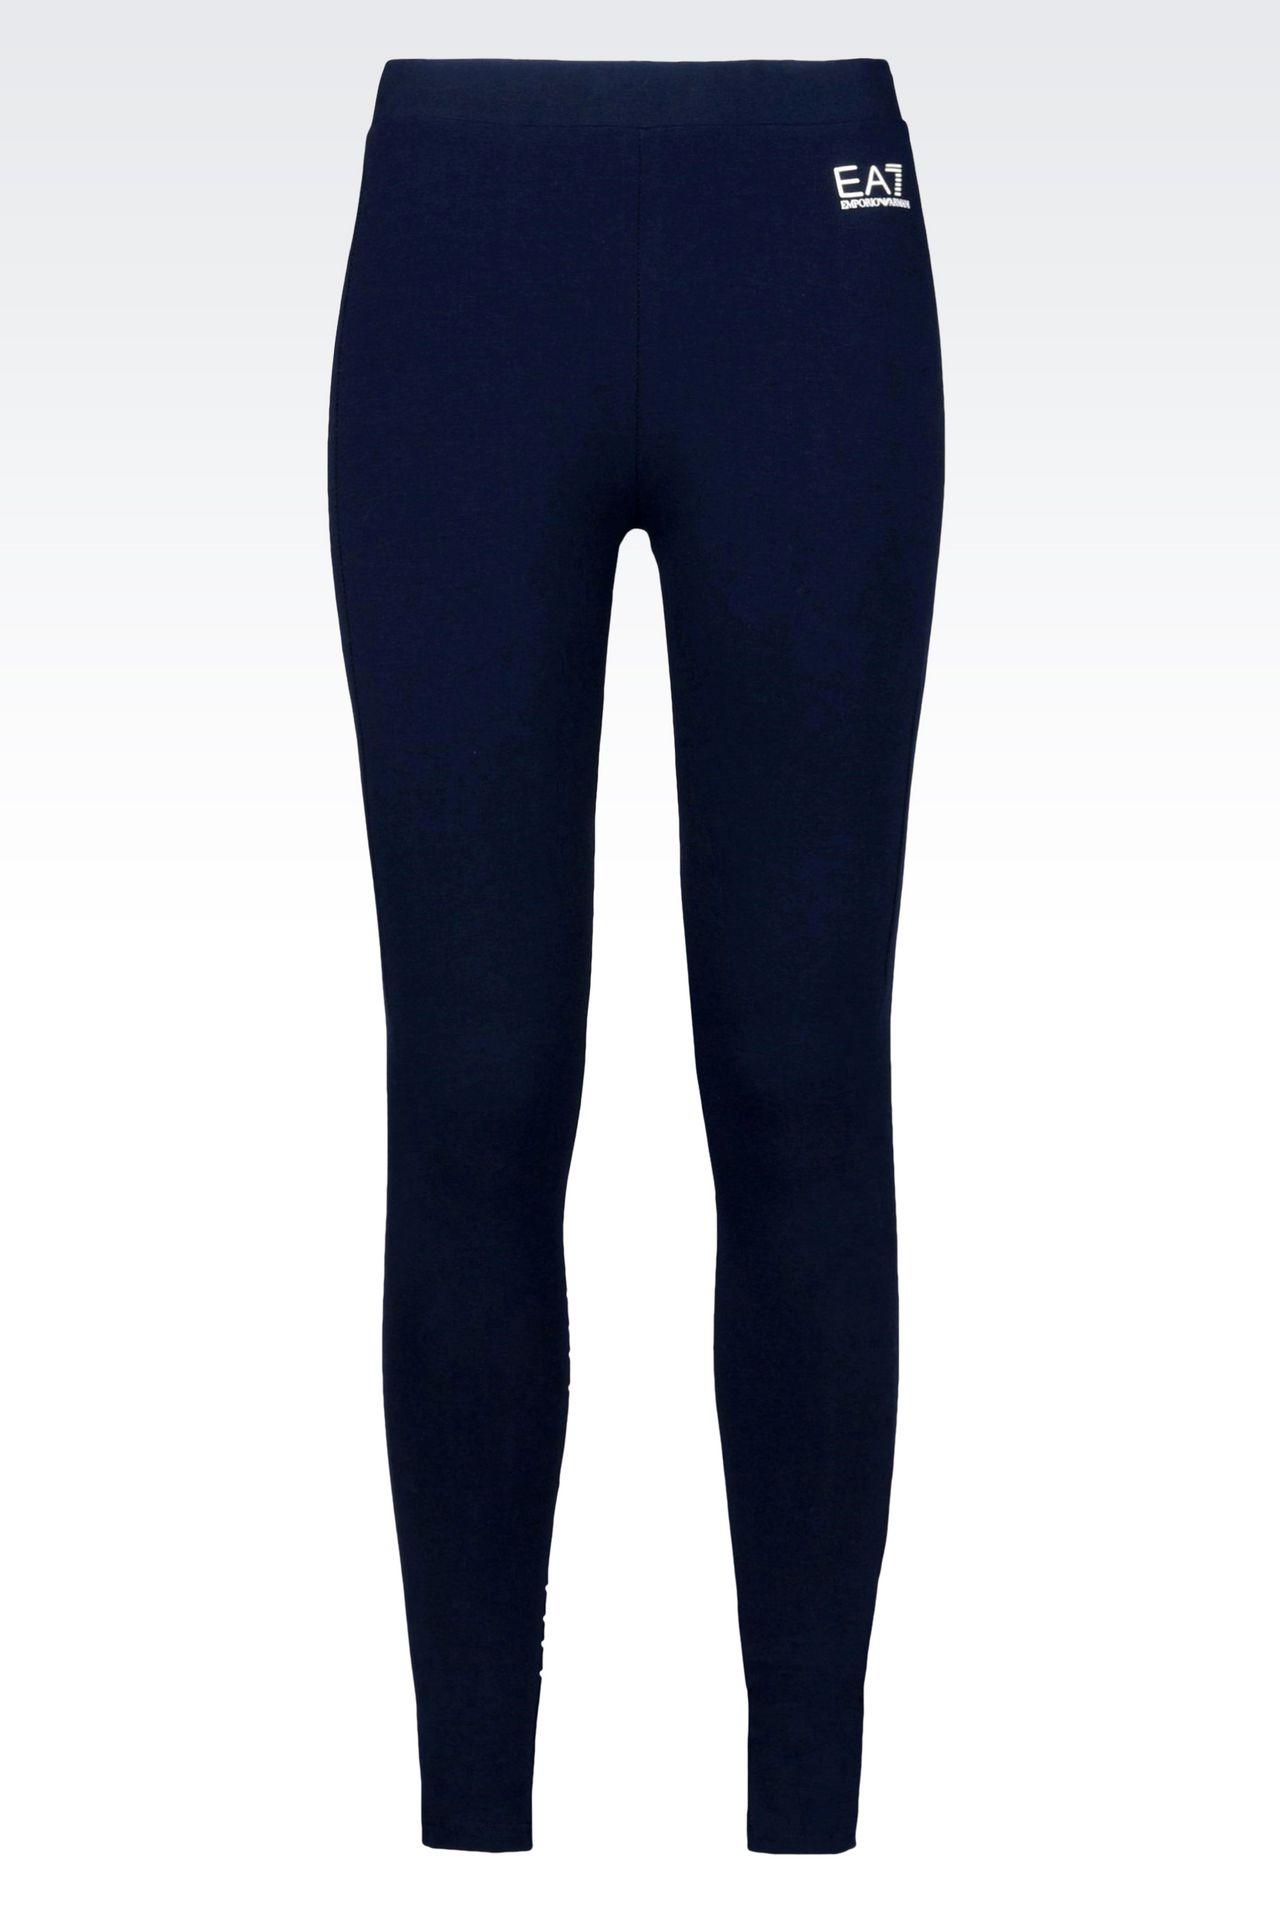 7COLOURS LINE JERSEY LEGGINGS: Leggings Women by Armani - 0